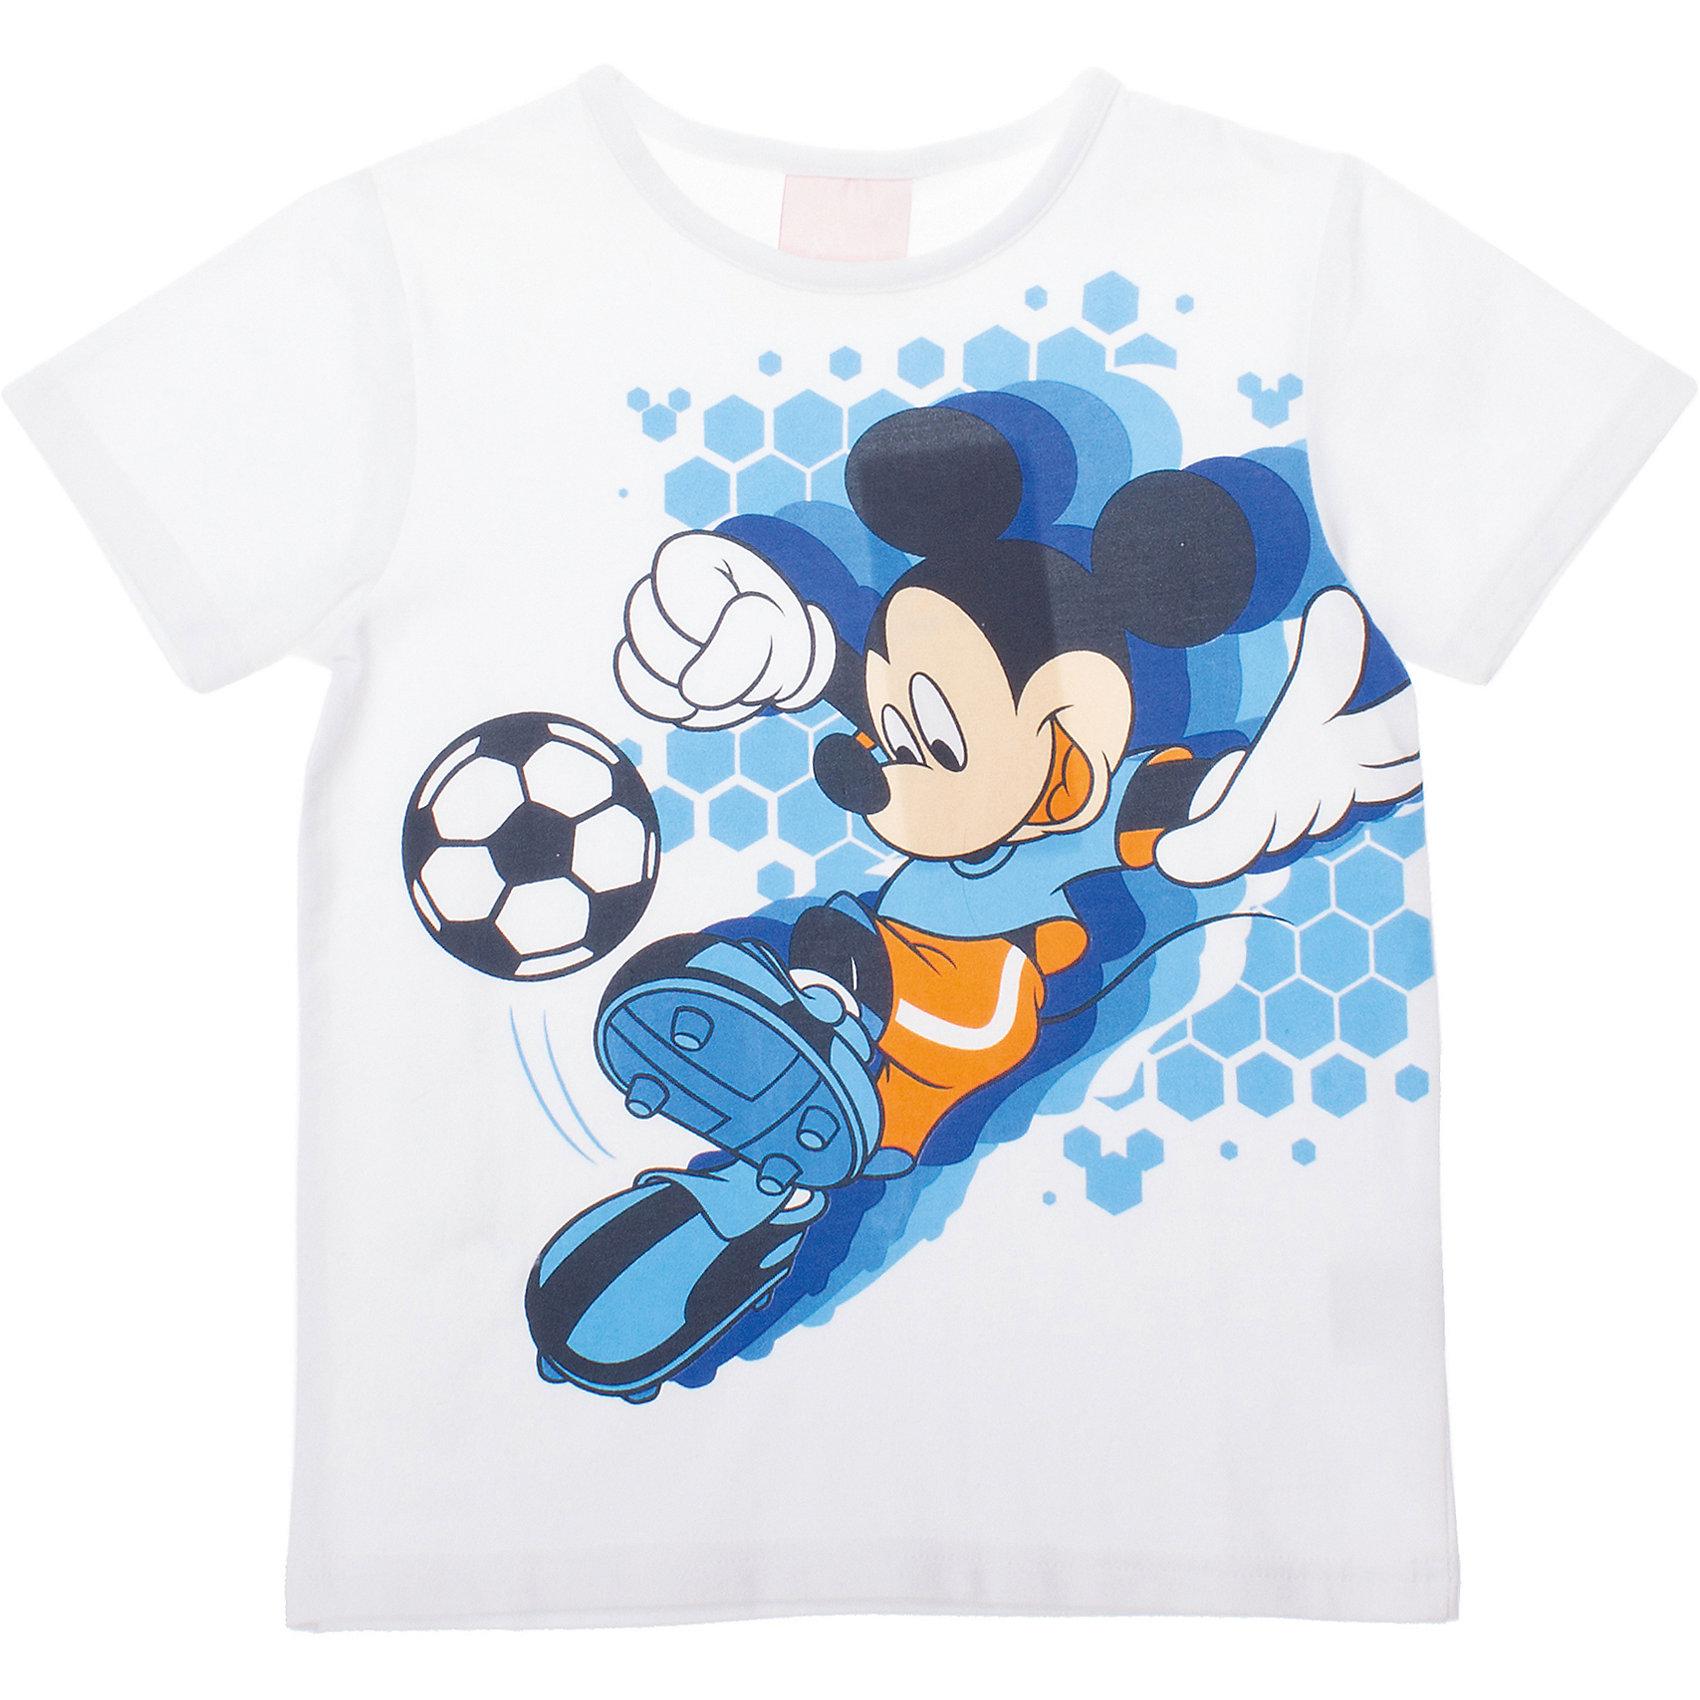 PlayToday Футболка для мальчика PlayToday футболка playtoday футболка